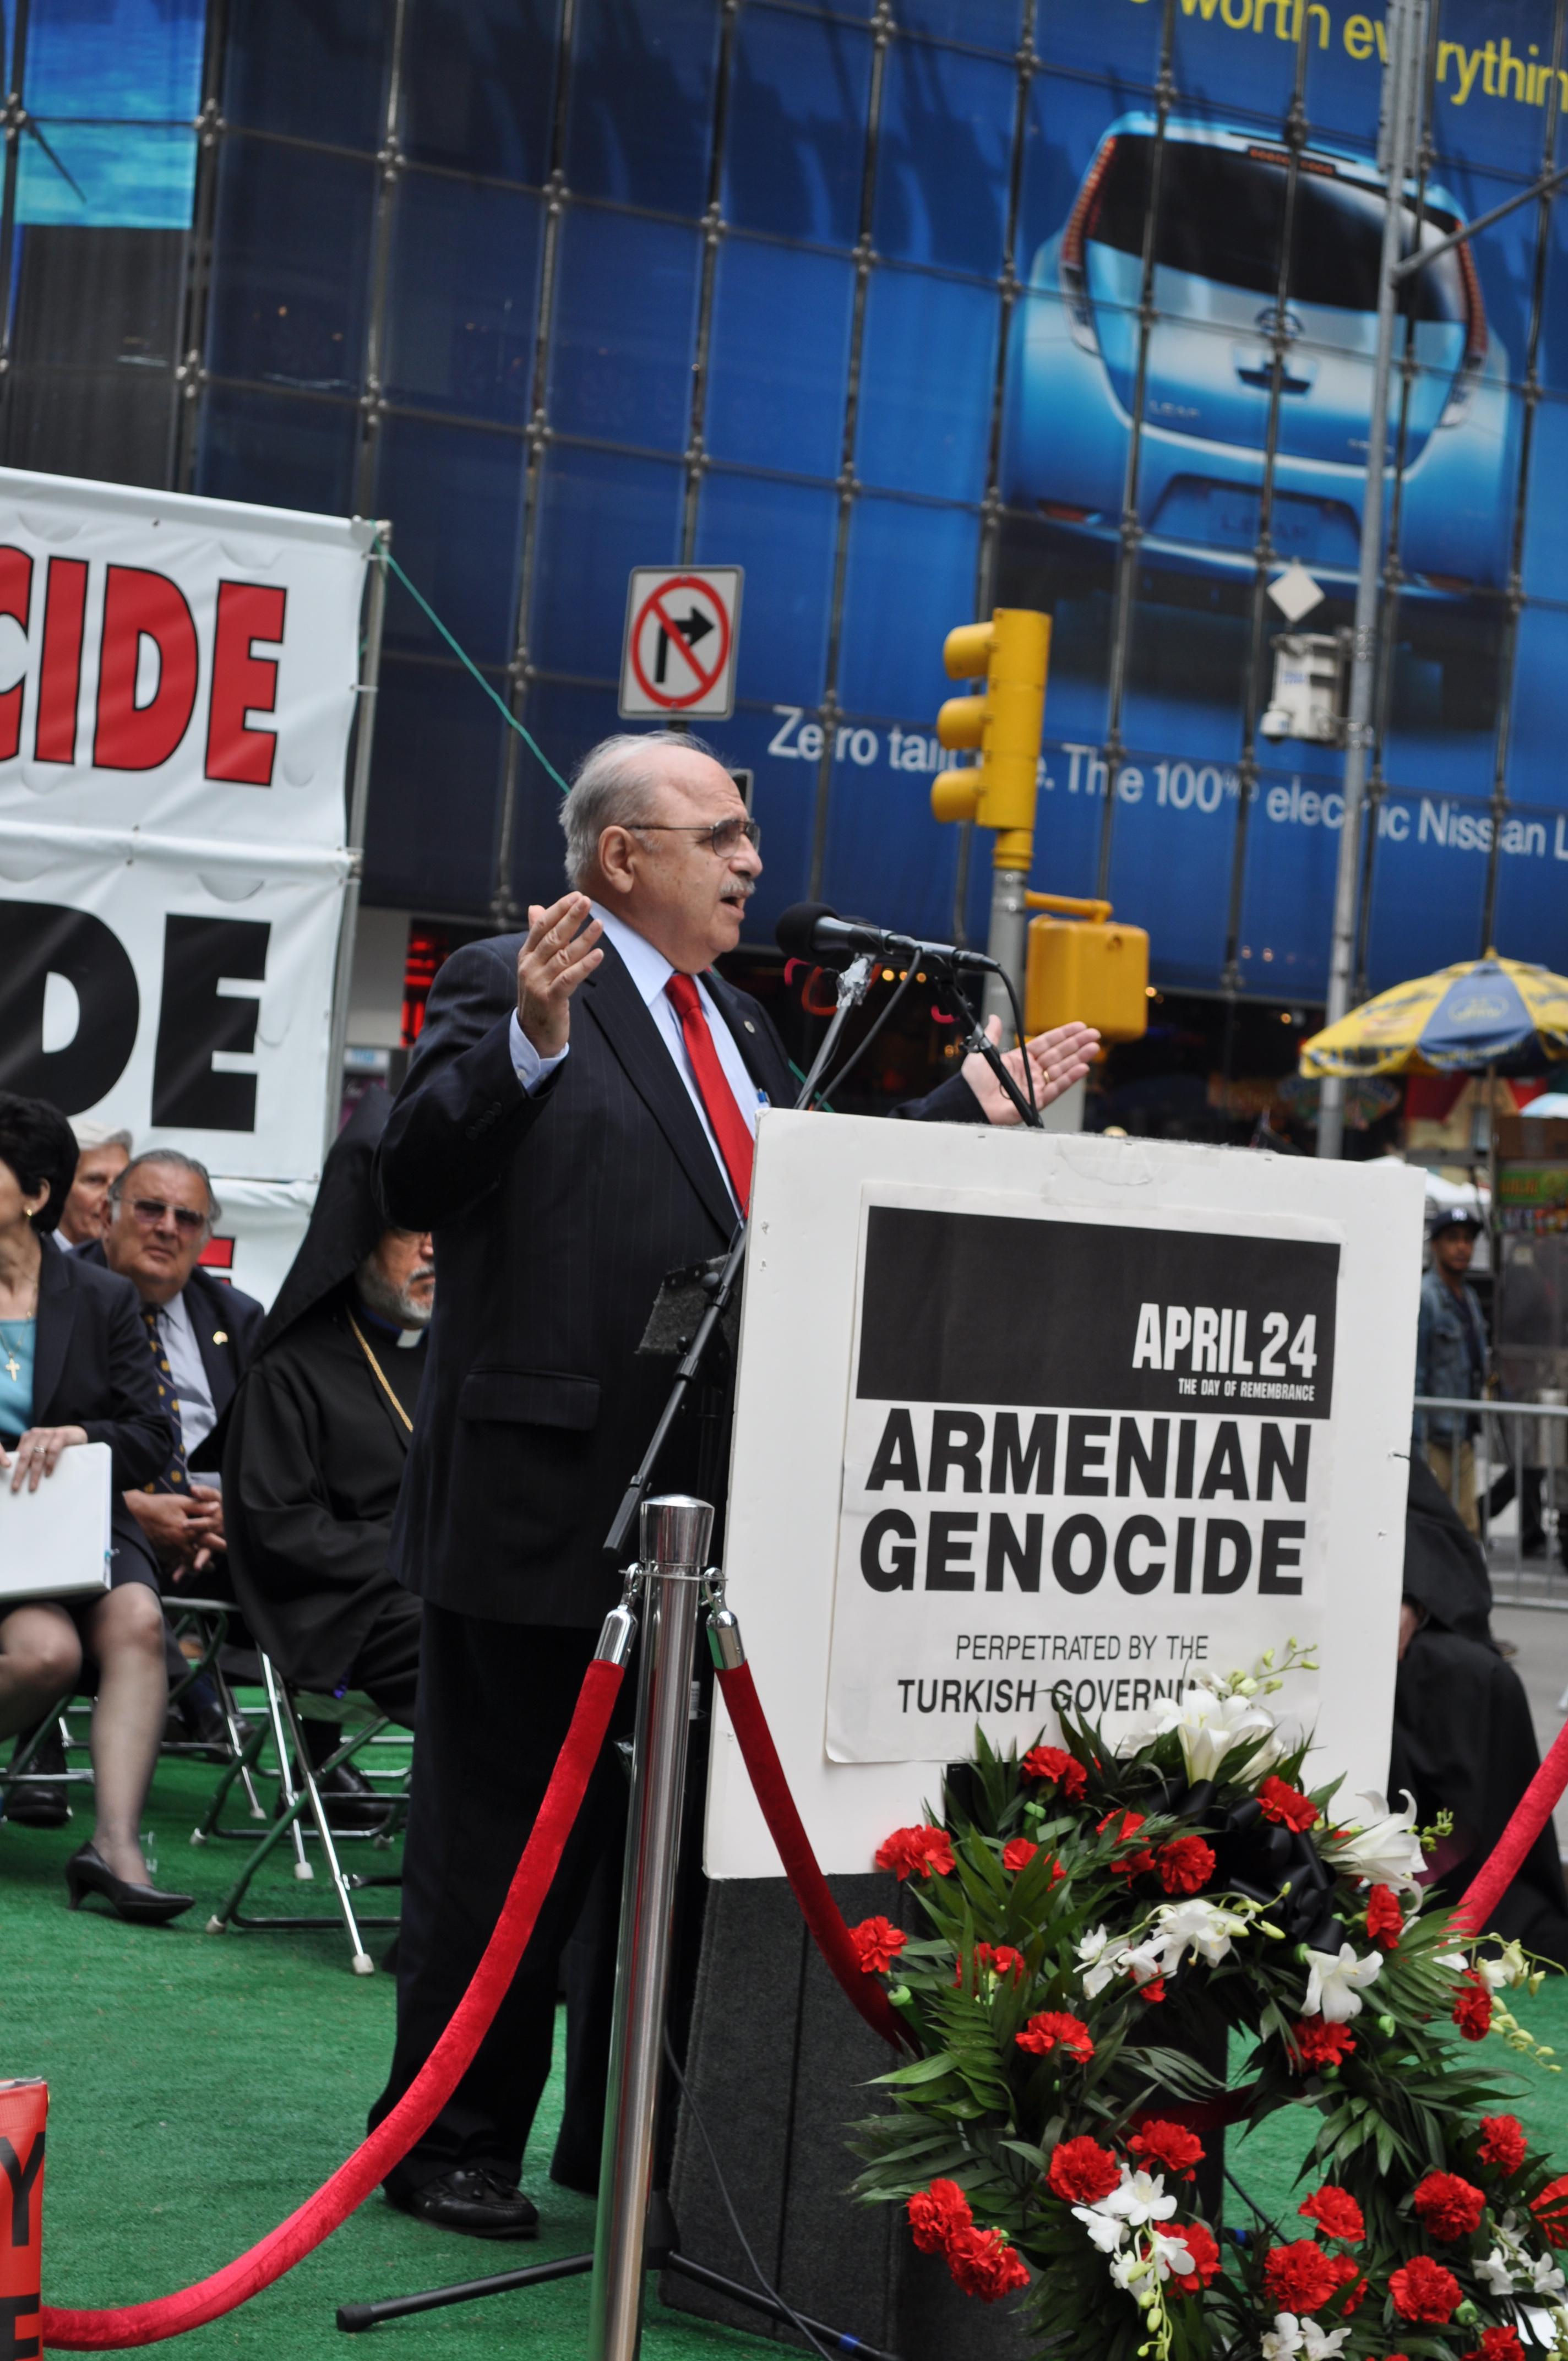 armenian genocide commemoration essay contest